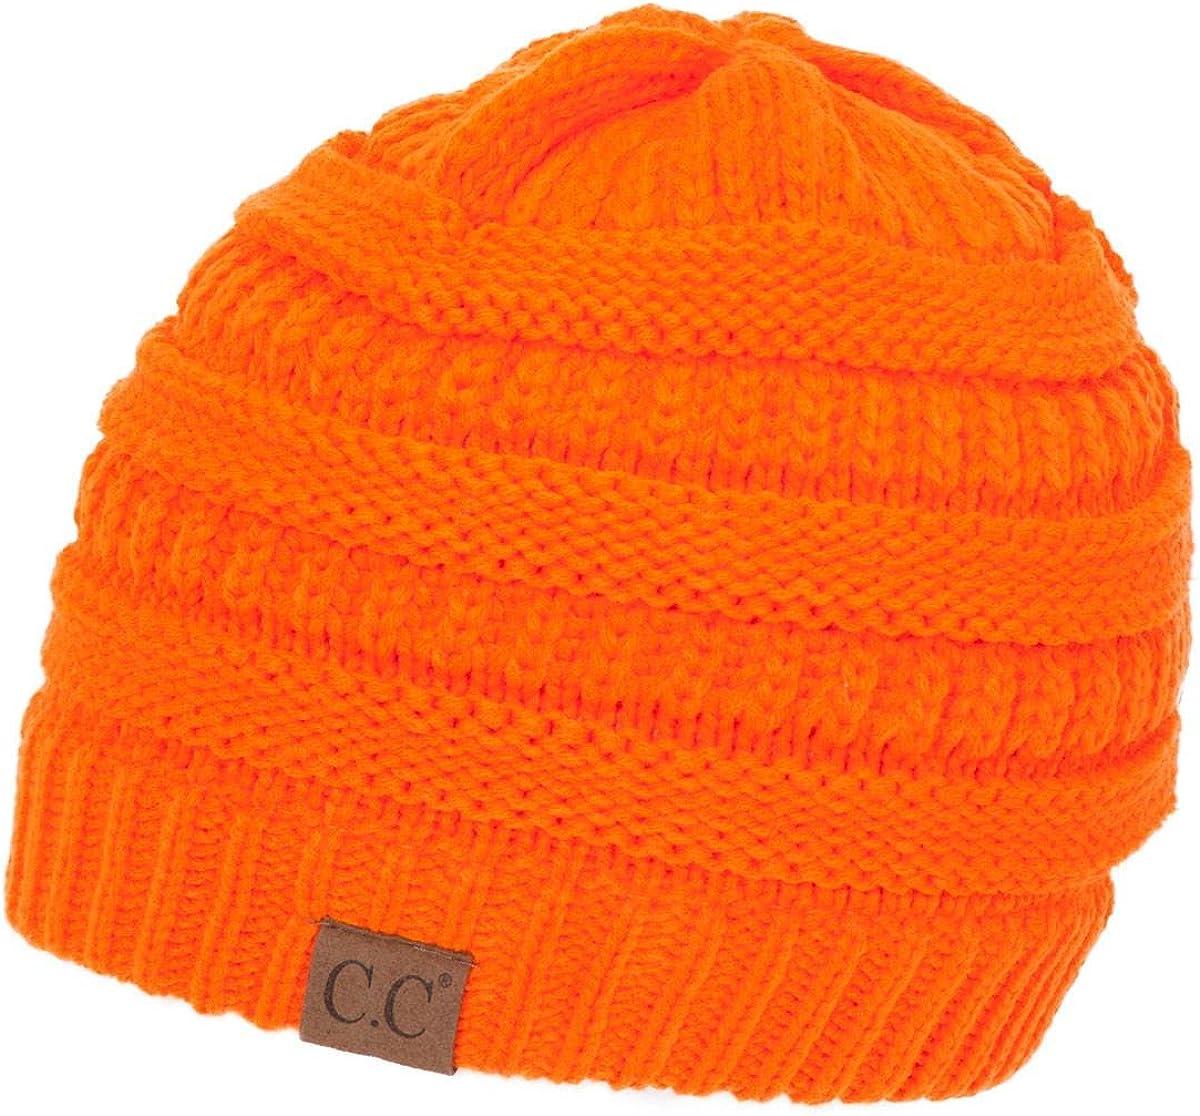 C.C Women's Thick Soft Reservation Cap Knit service Hat Beanie